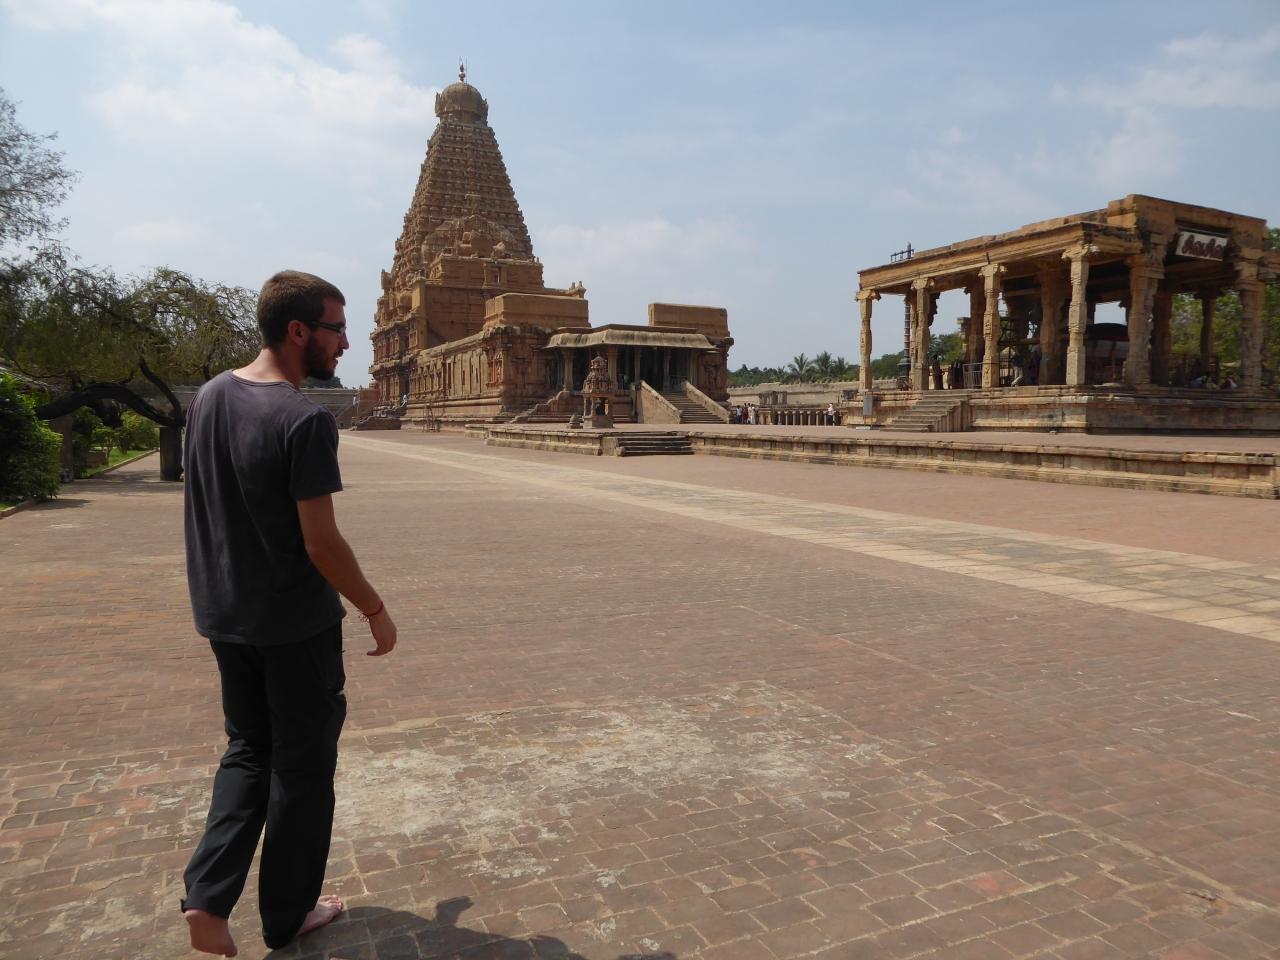 Tempeltocht in Tamil Nadu: Trichy enThanjavur